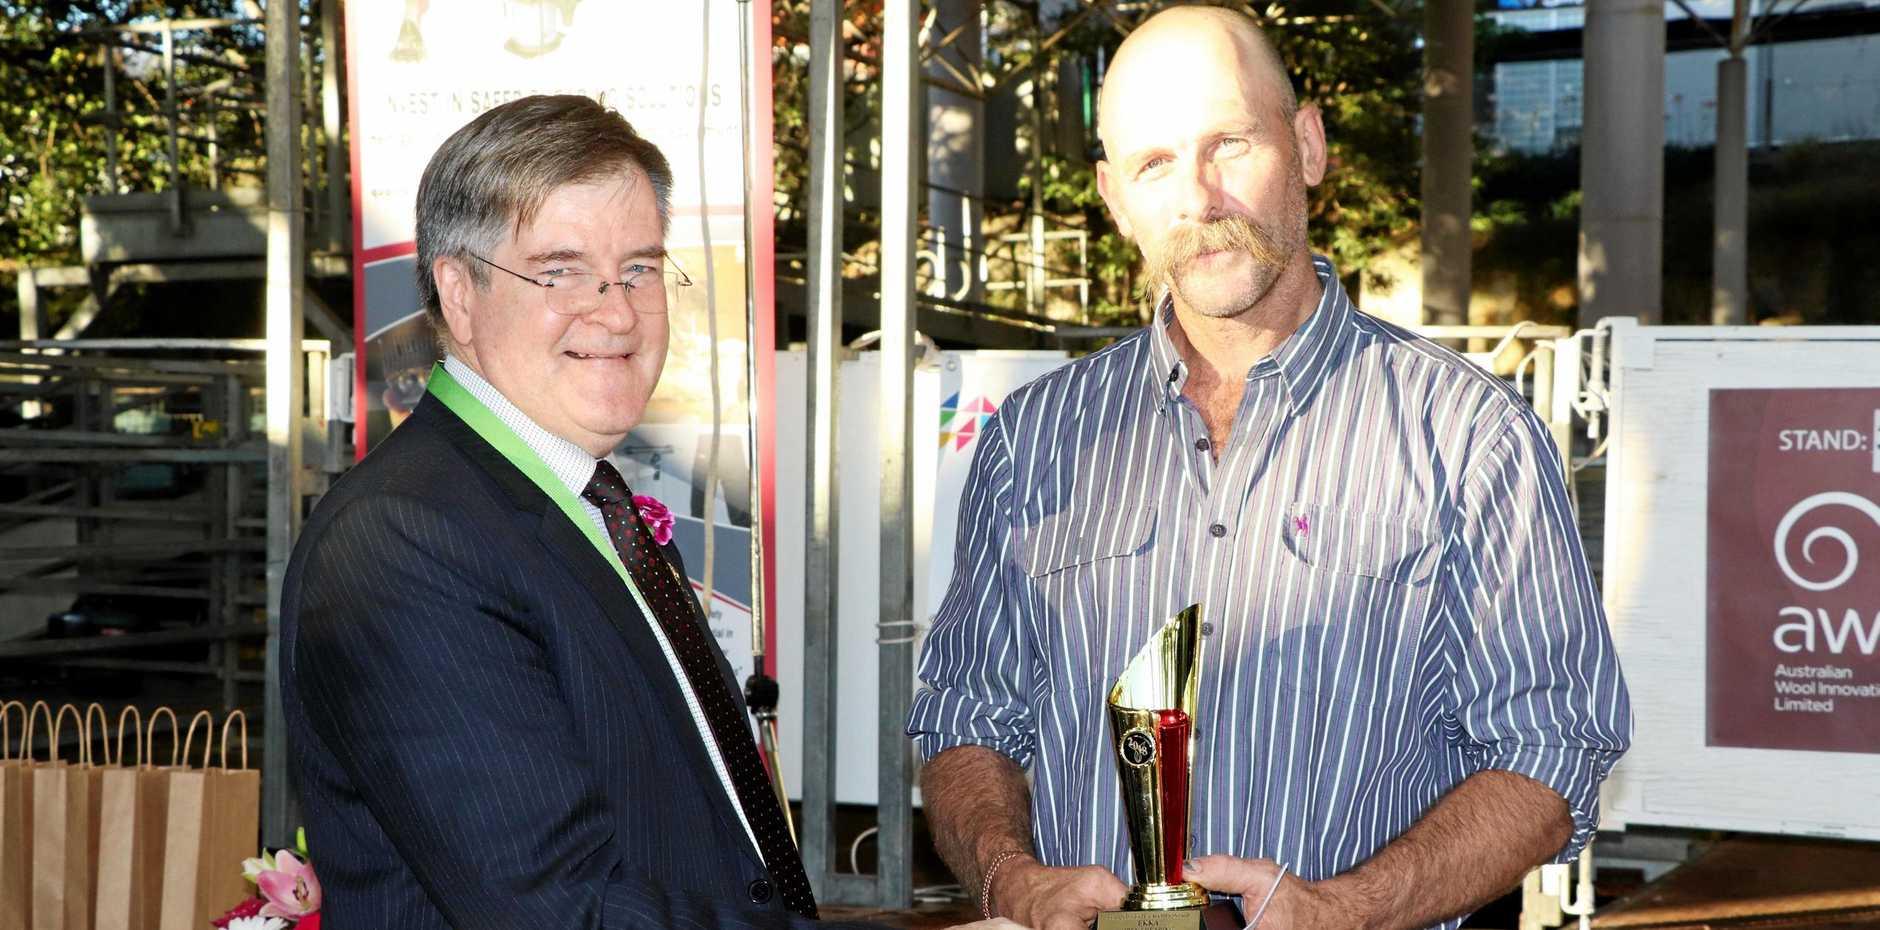 CHAMPION: RNA President David Thomas presenting Phil Schoff (right) with his award at the Ekka.